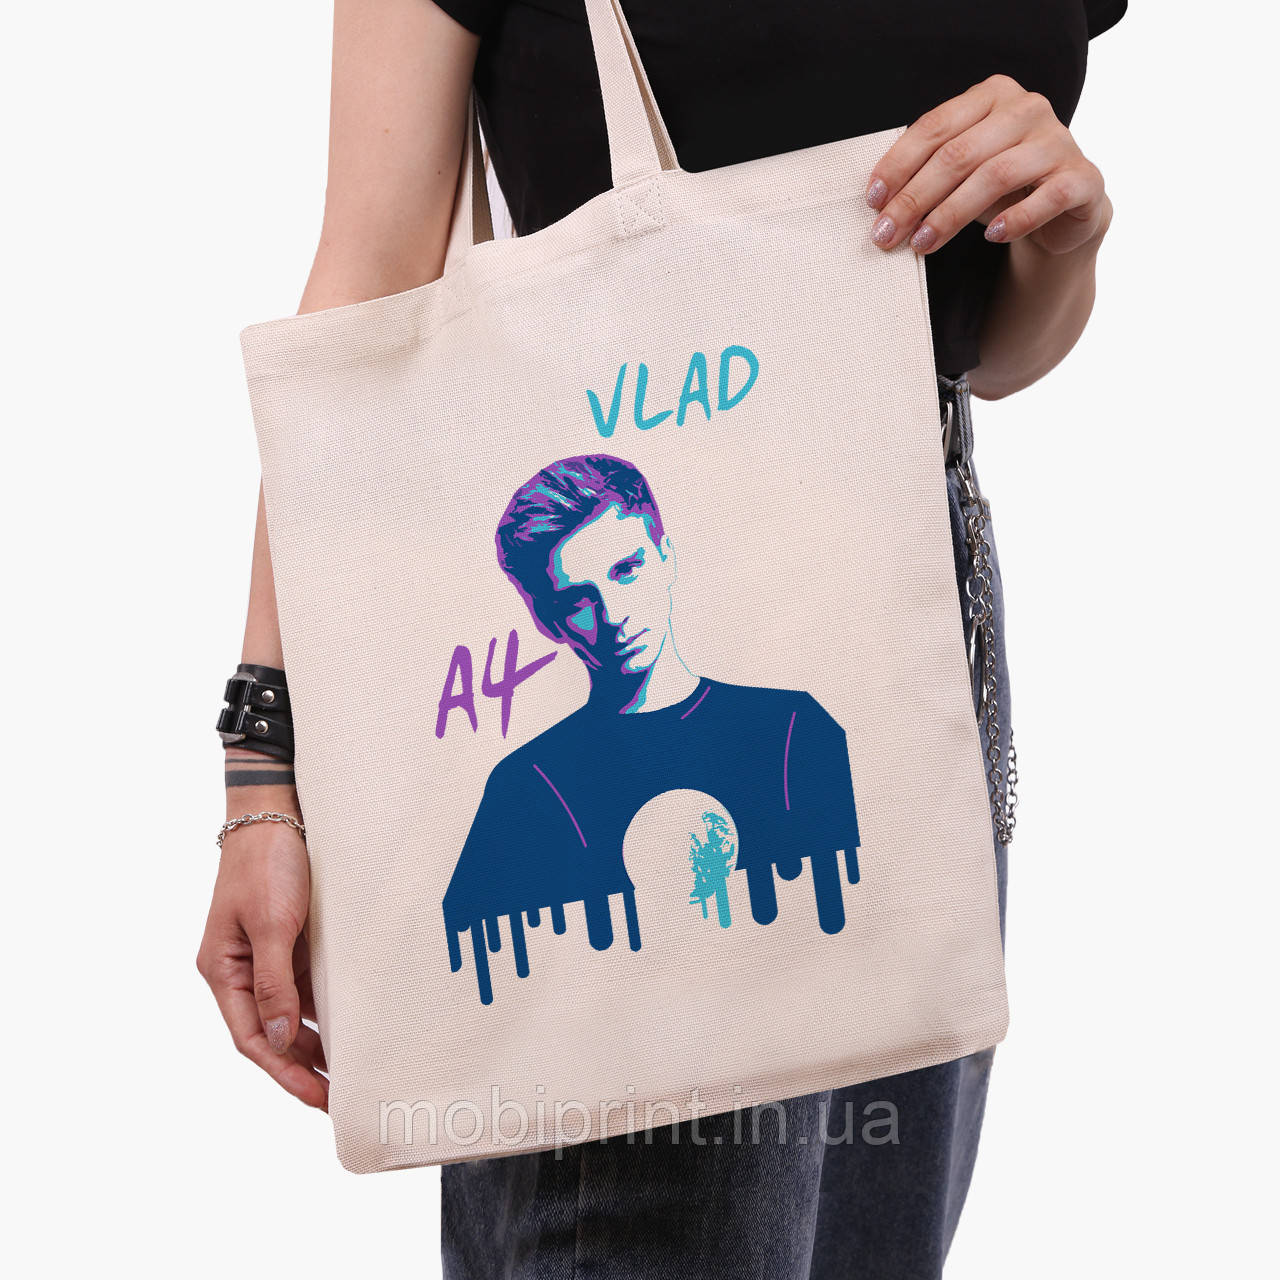 Эко сумка шоппер блогер Влад Бумага А4 (blogger Vlad A4) (9227-2623)  41*35 см